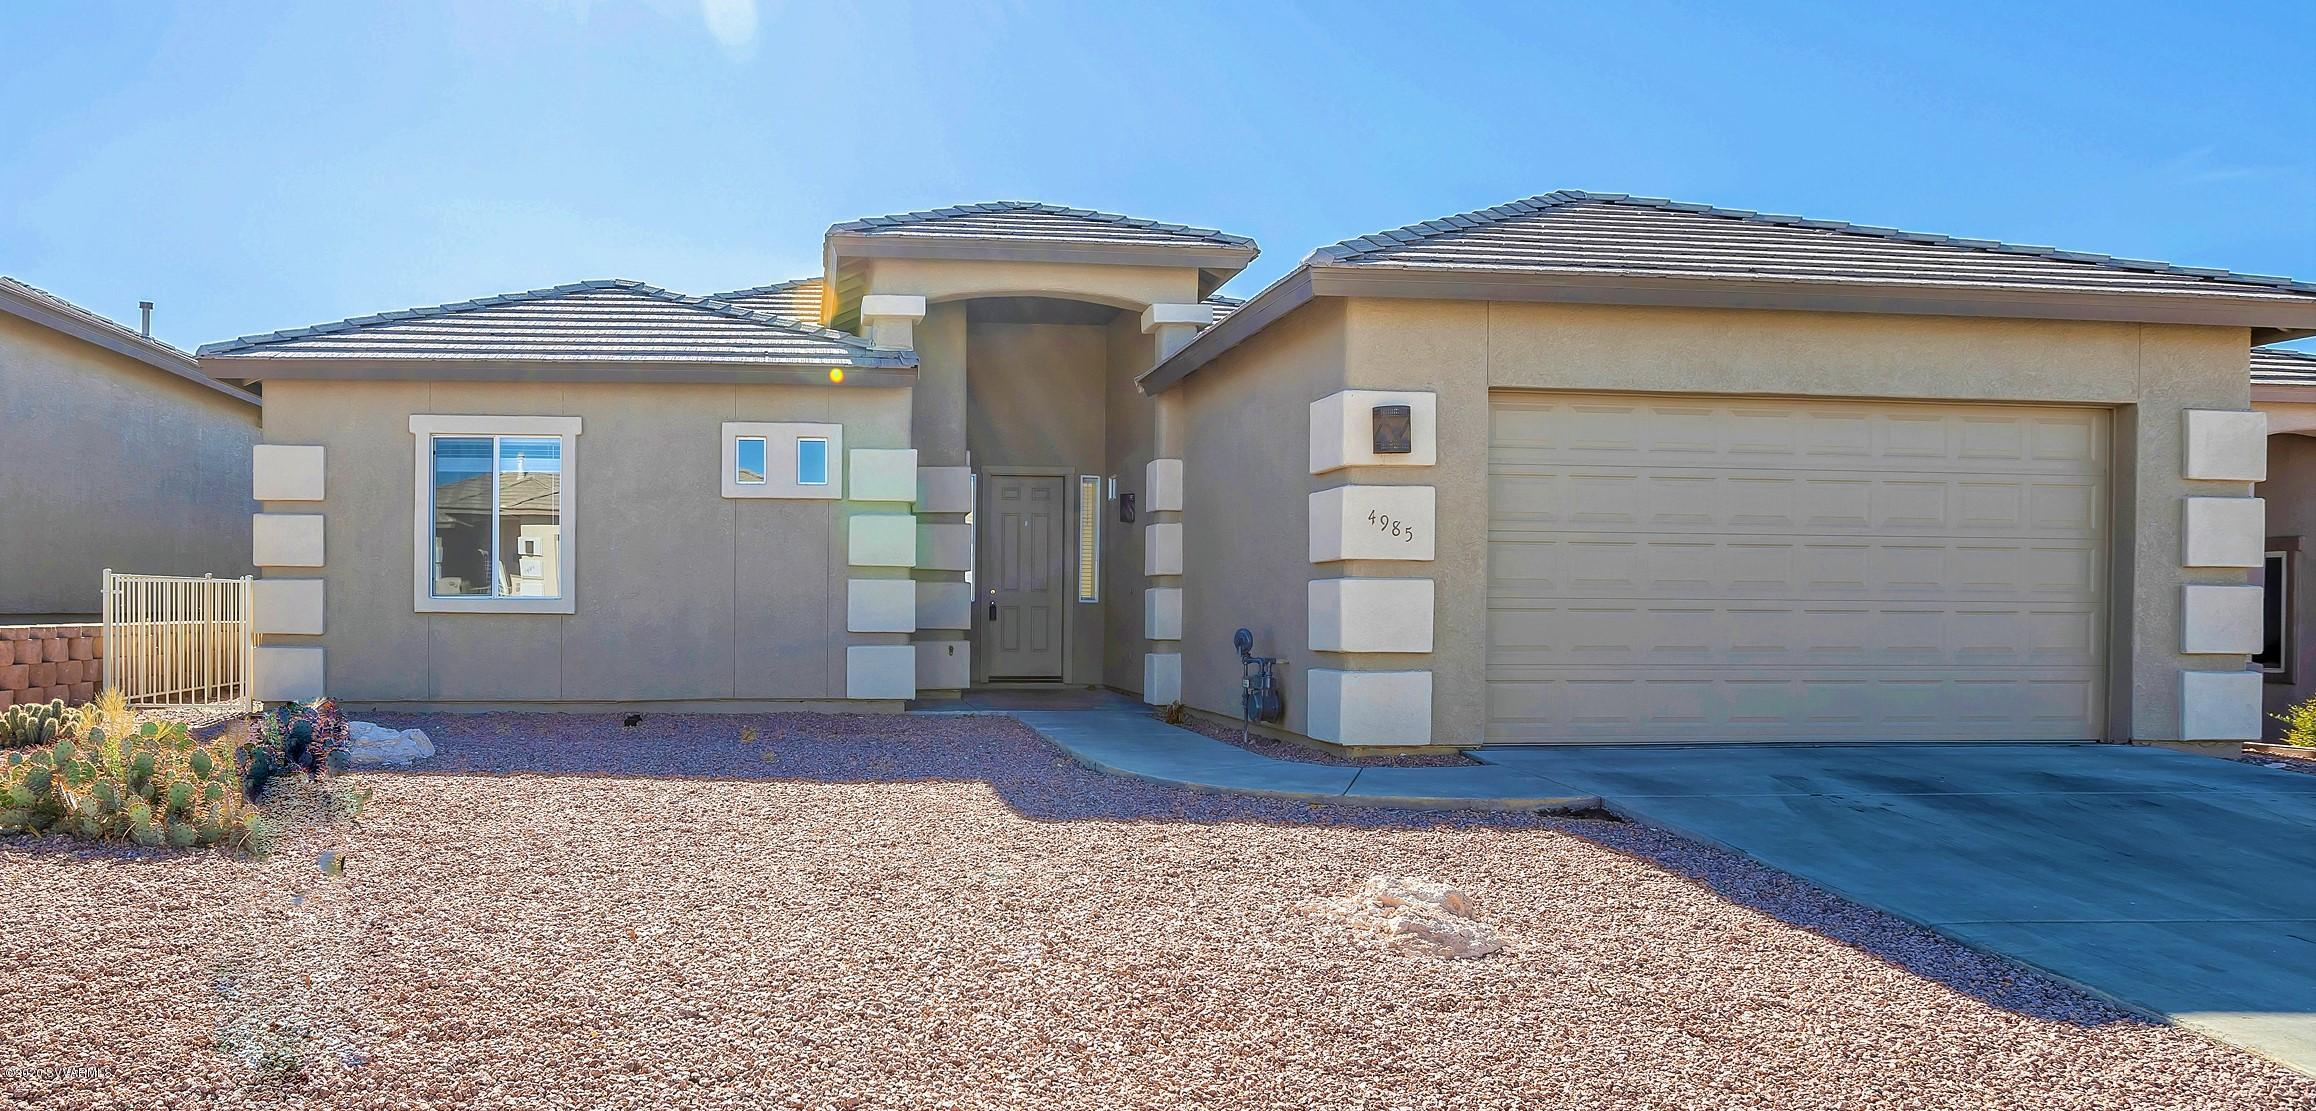 4985 E Nighthawk Drive Cornville, AZ 86325